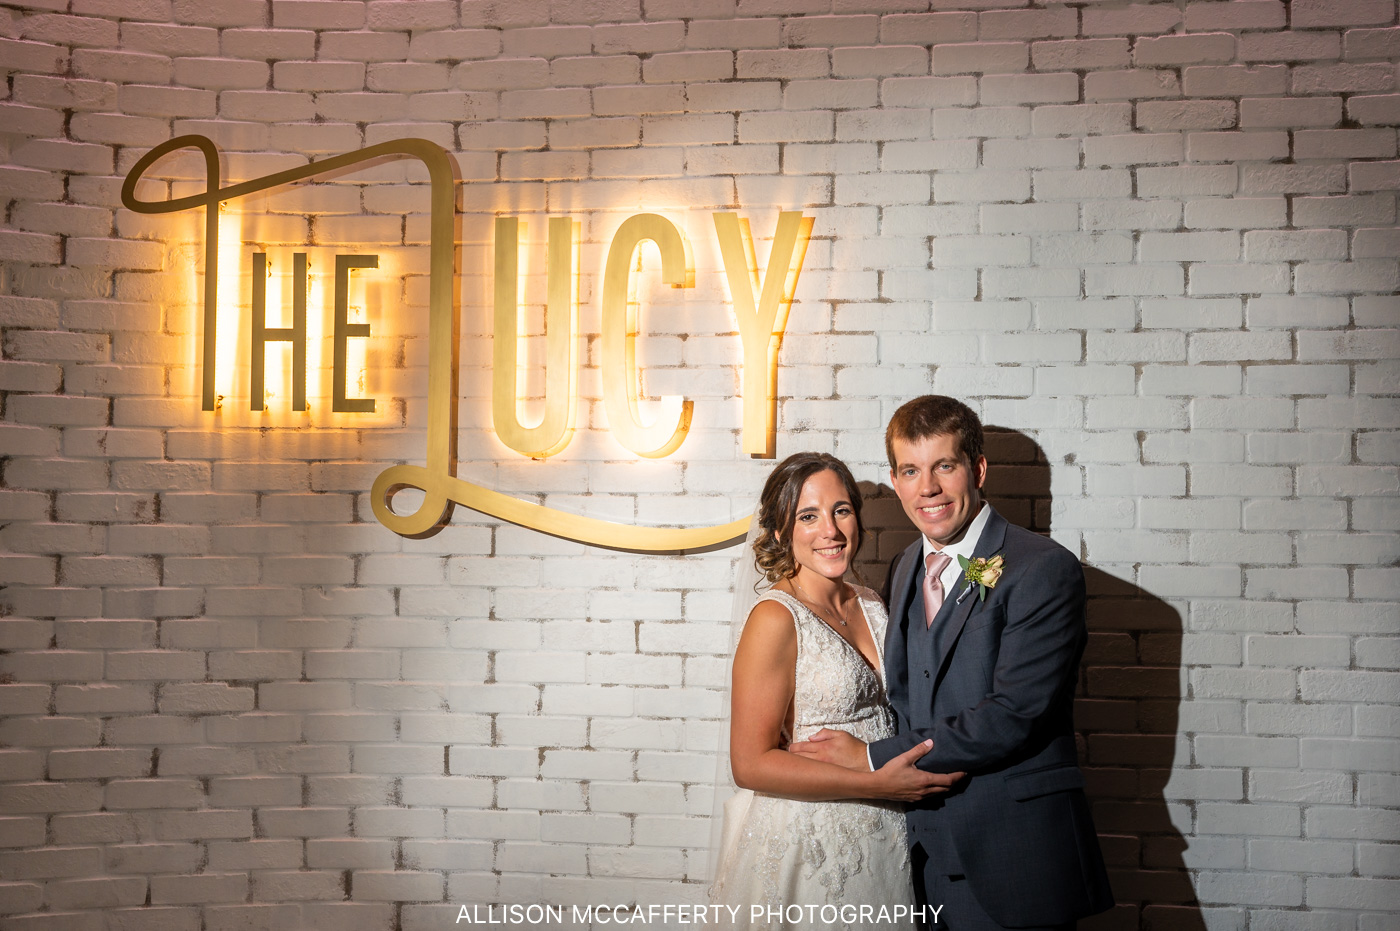 Cescaphe The Lucy Wedding Vendors